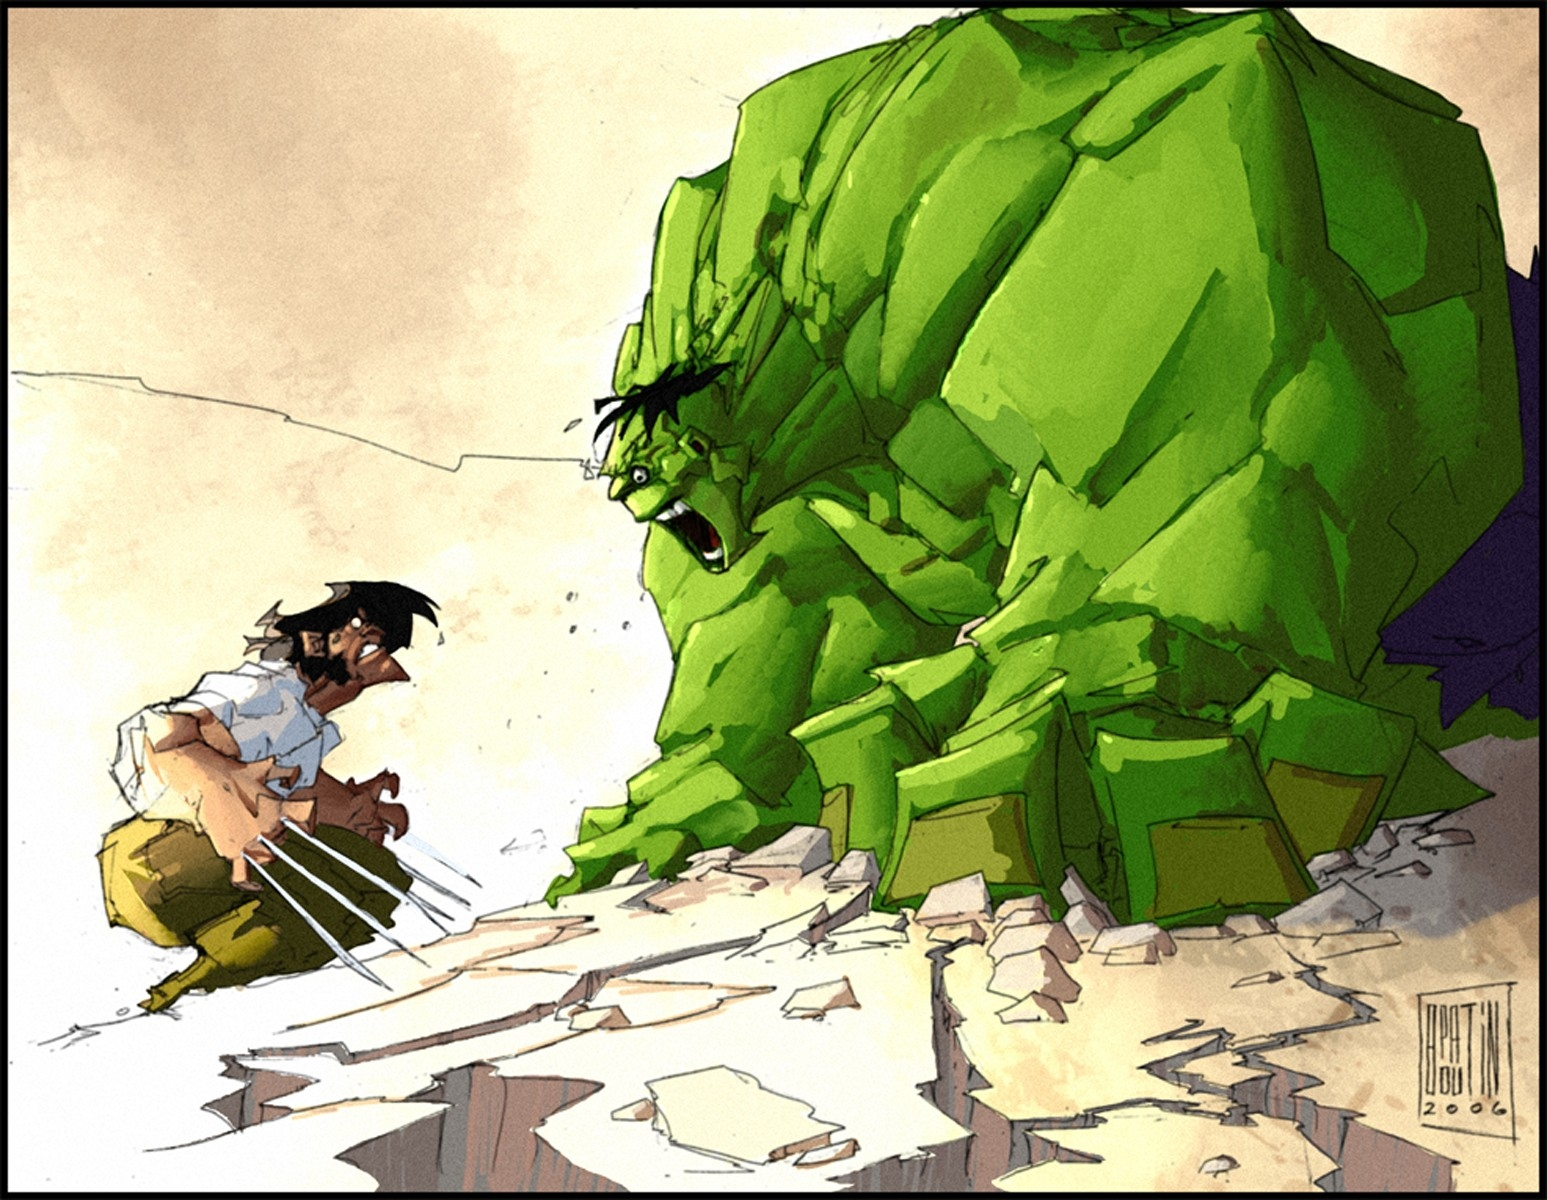 hulk comic character comics xmen wolverine superheroes heroes 1547x1200